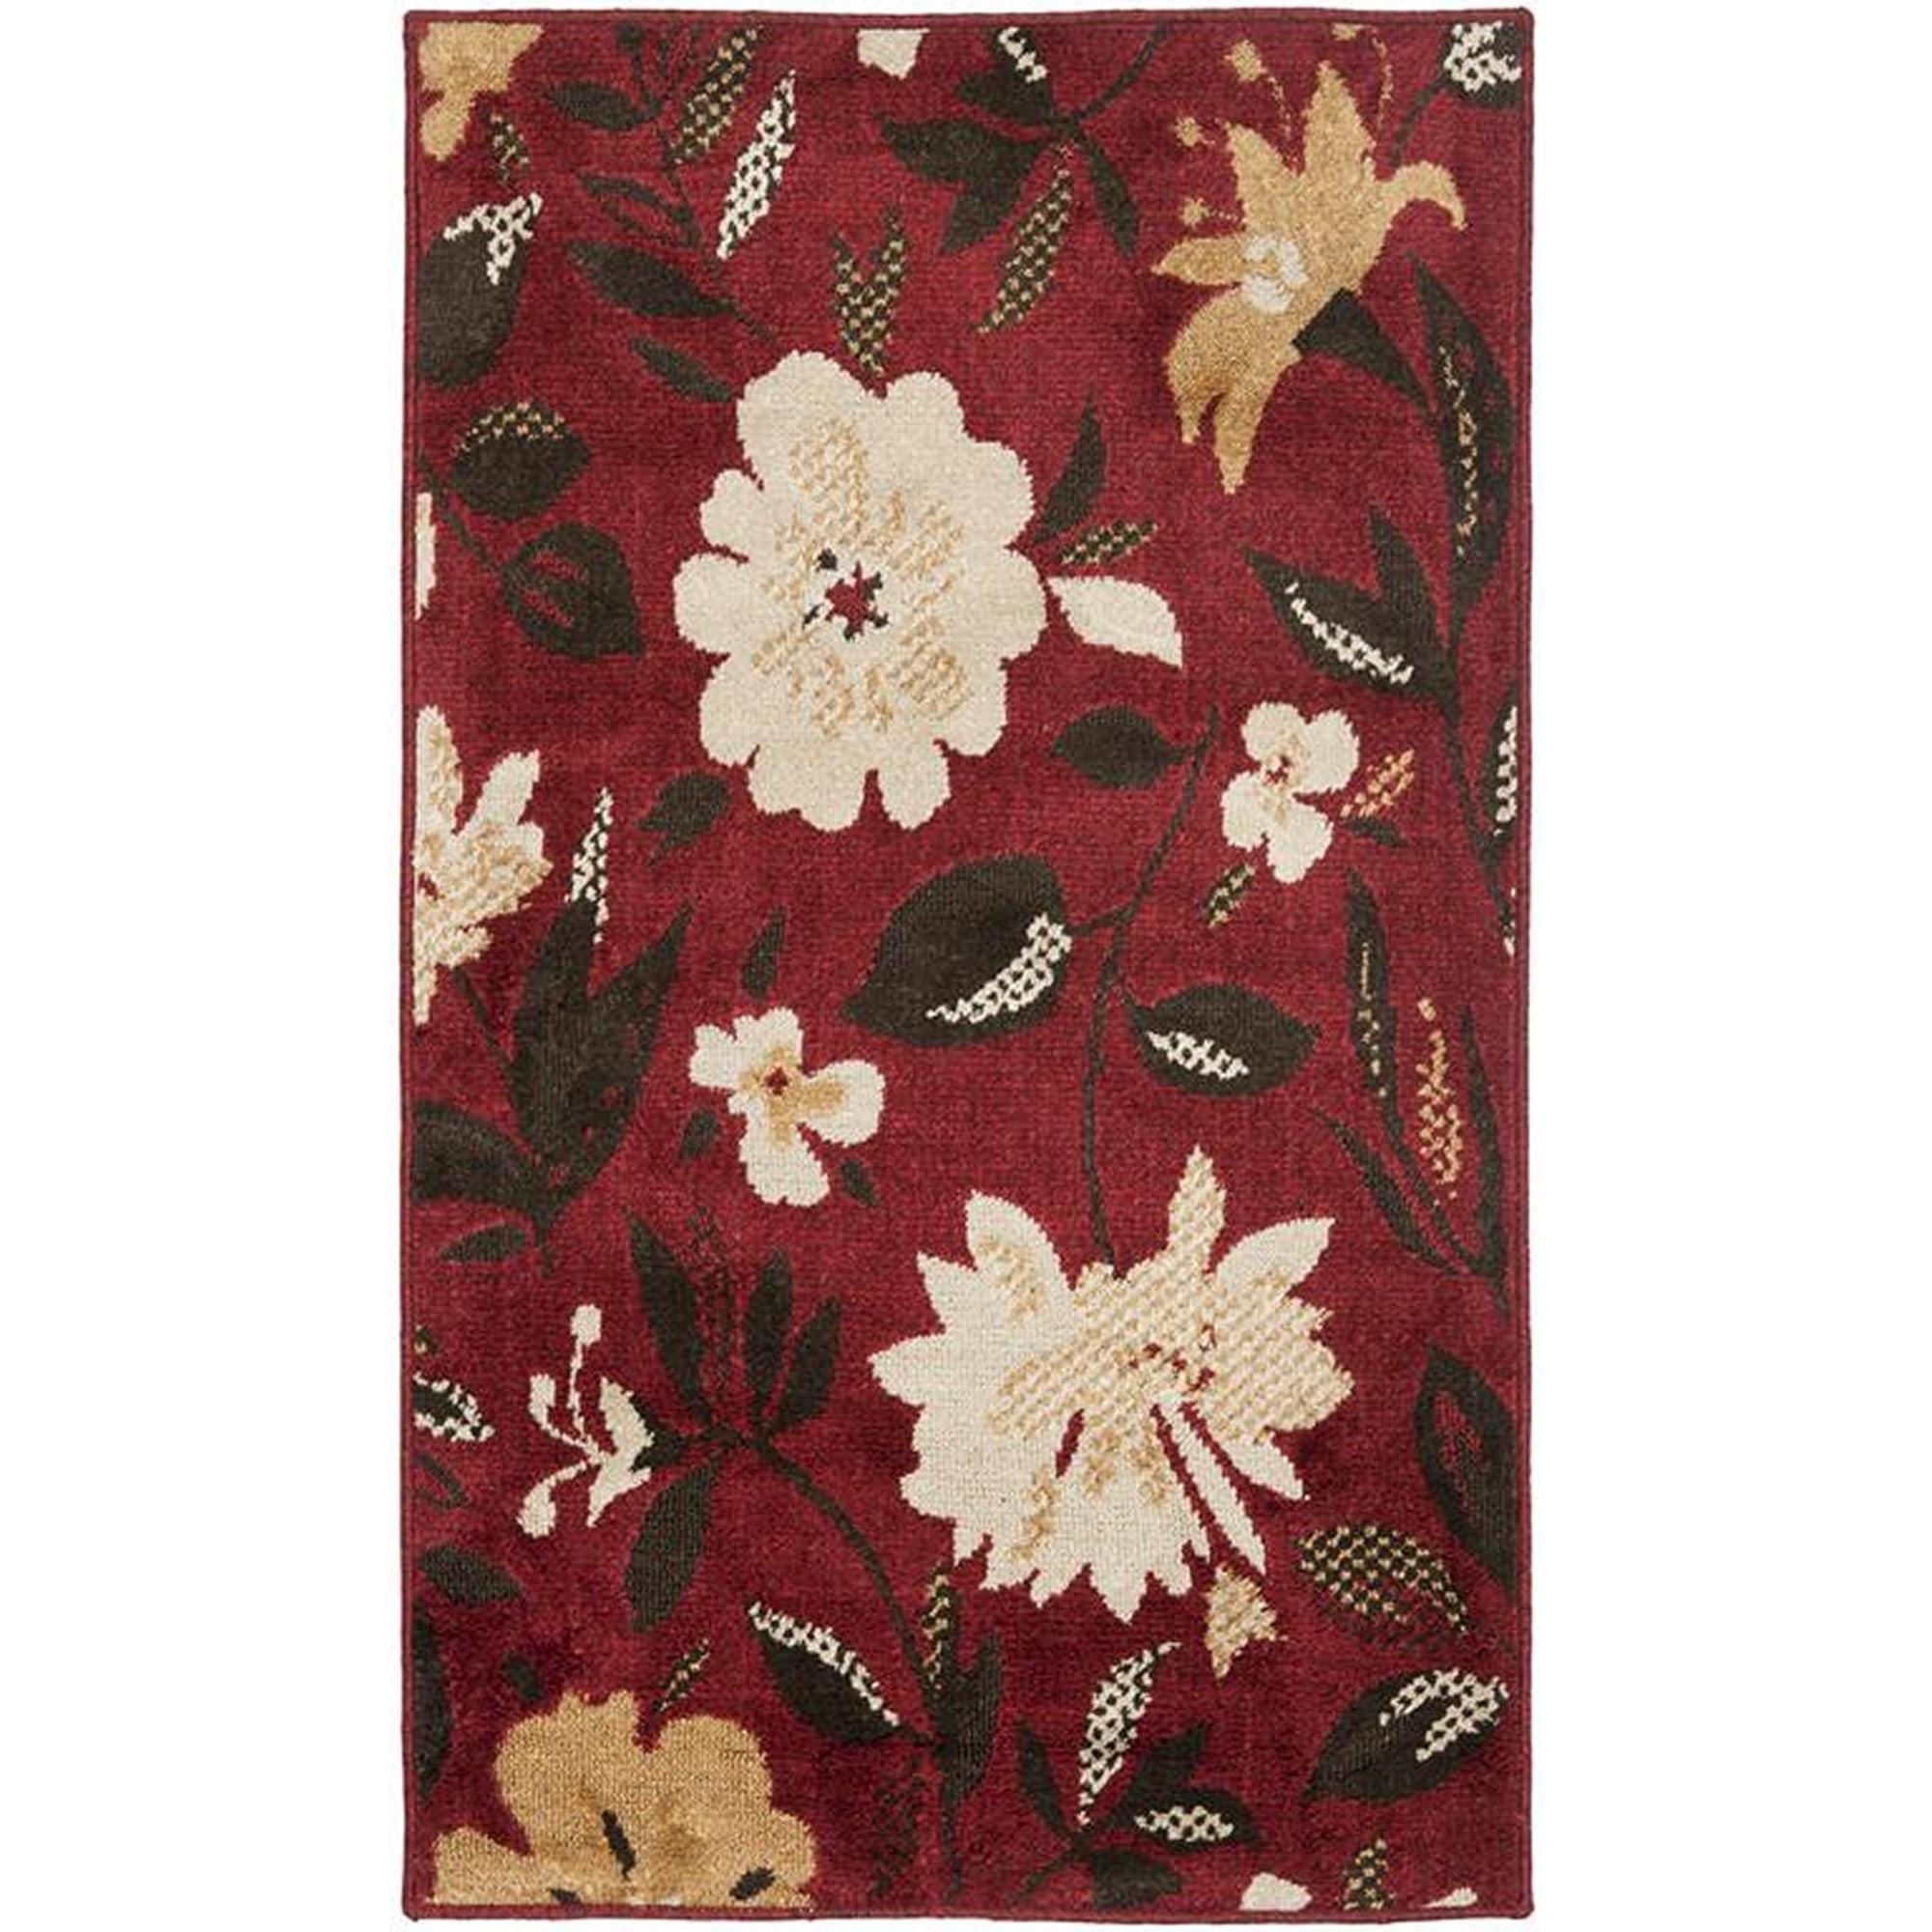 Safavieh Kashmir Red Floral Rug (8' x 10') (KAS112B-8), S...